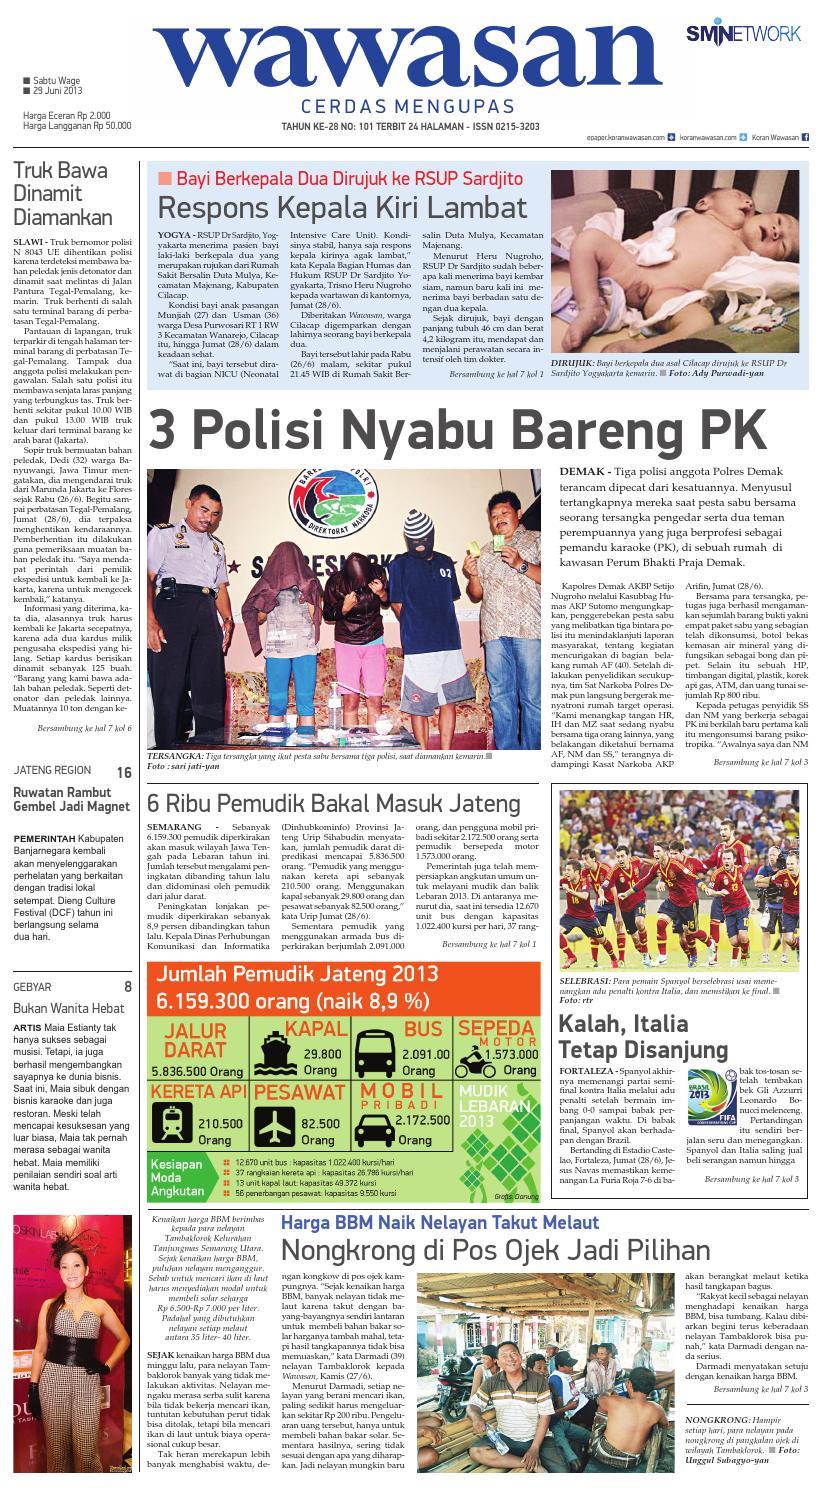 WAWASAN 29 Juni 2013 by KORAN PAGI WAWASAN - issuu 8125271008